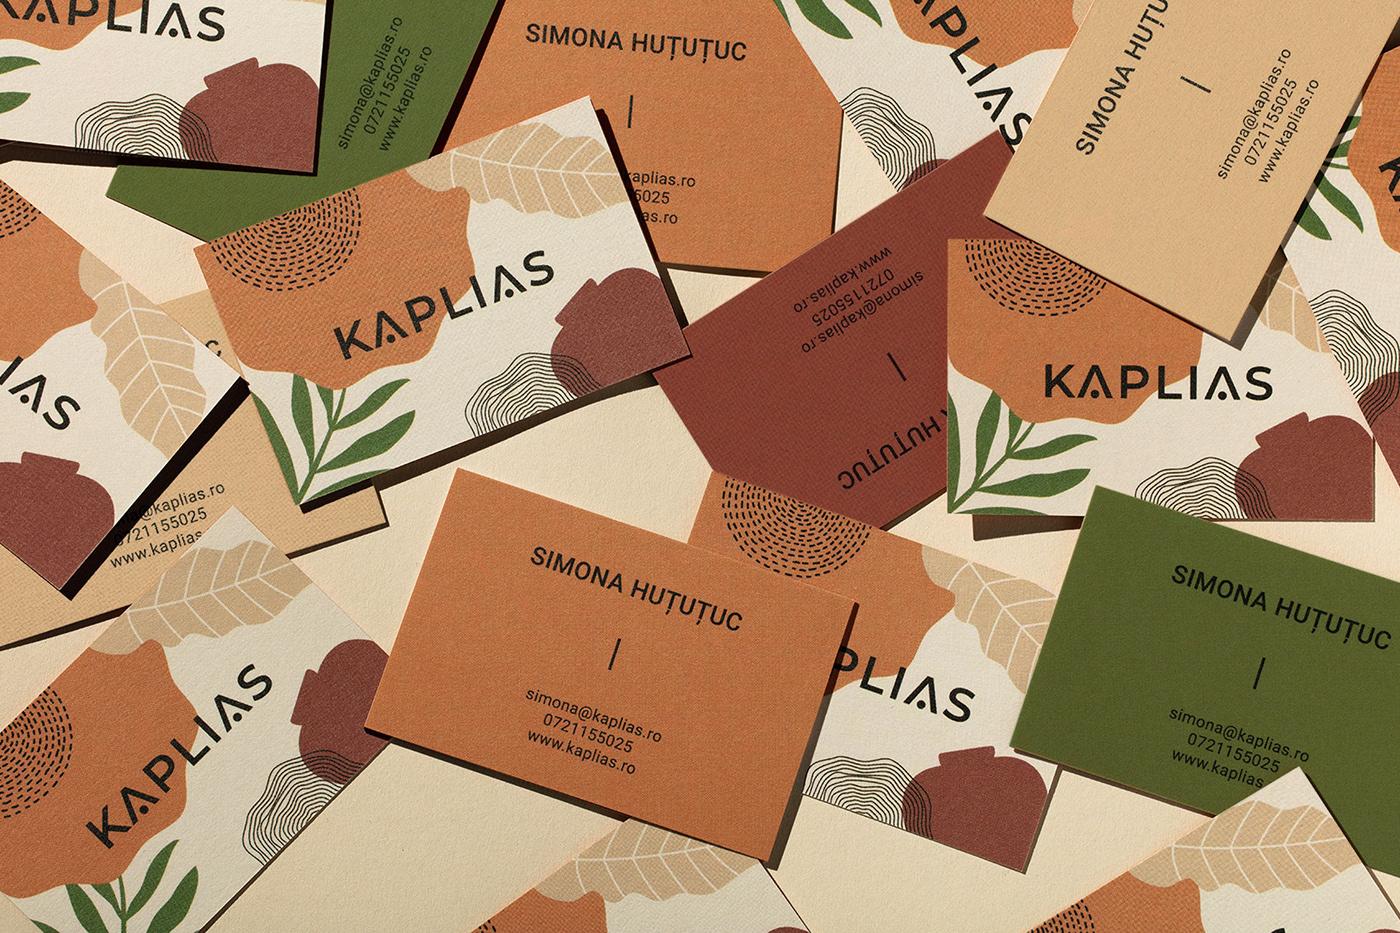 Thumbnail for Home Decor Brand Kaplias Wants to Inspire You